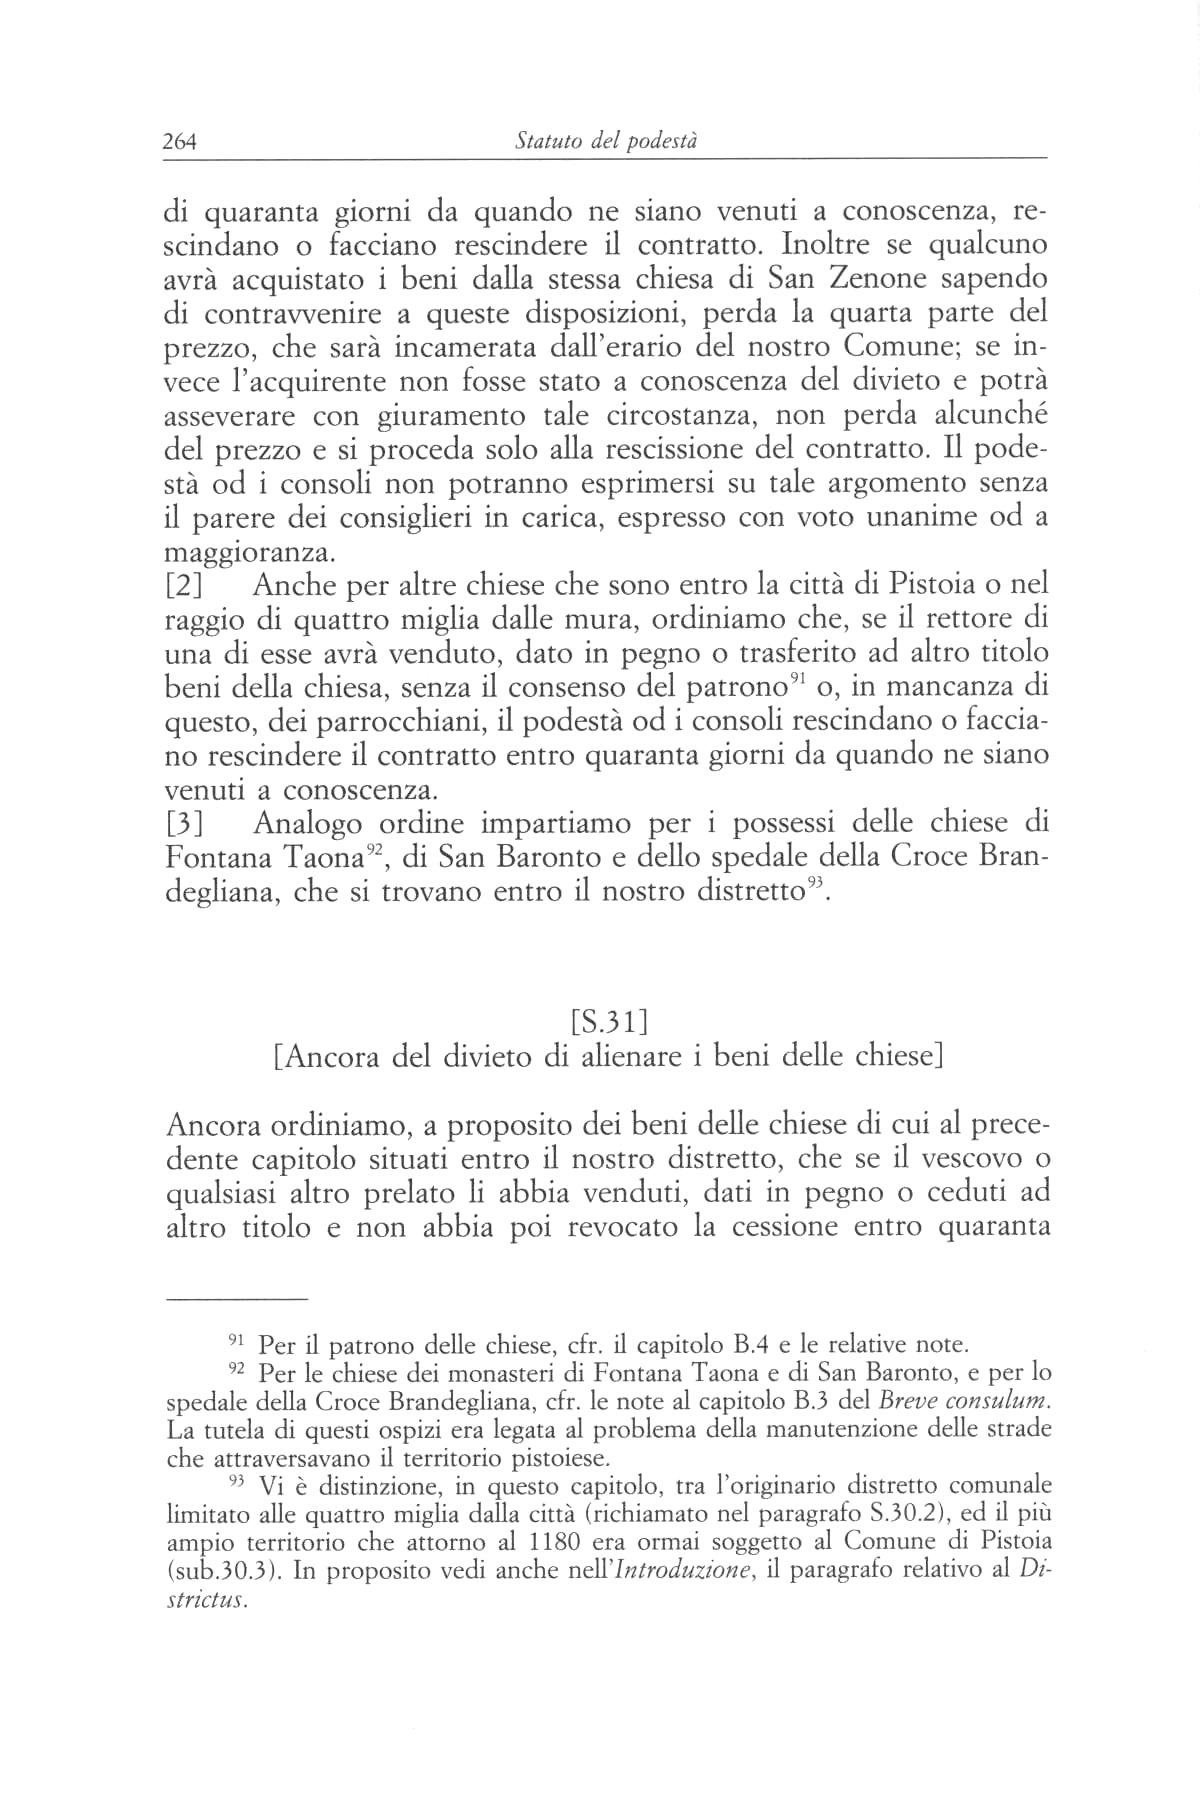 statuti pistoiesi del sec.XII 0264.jpg